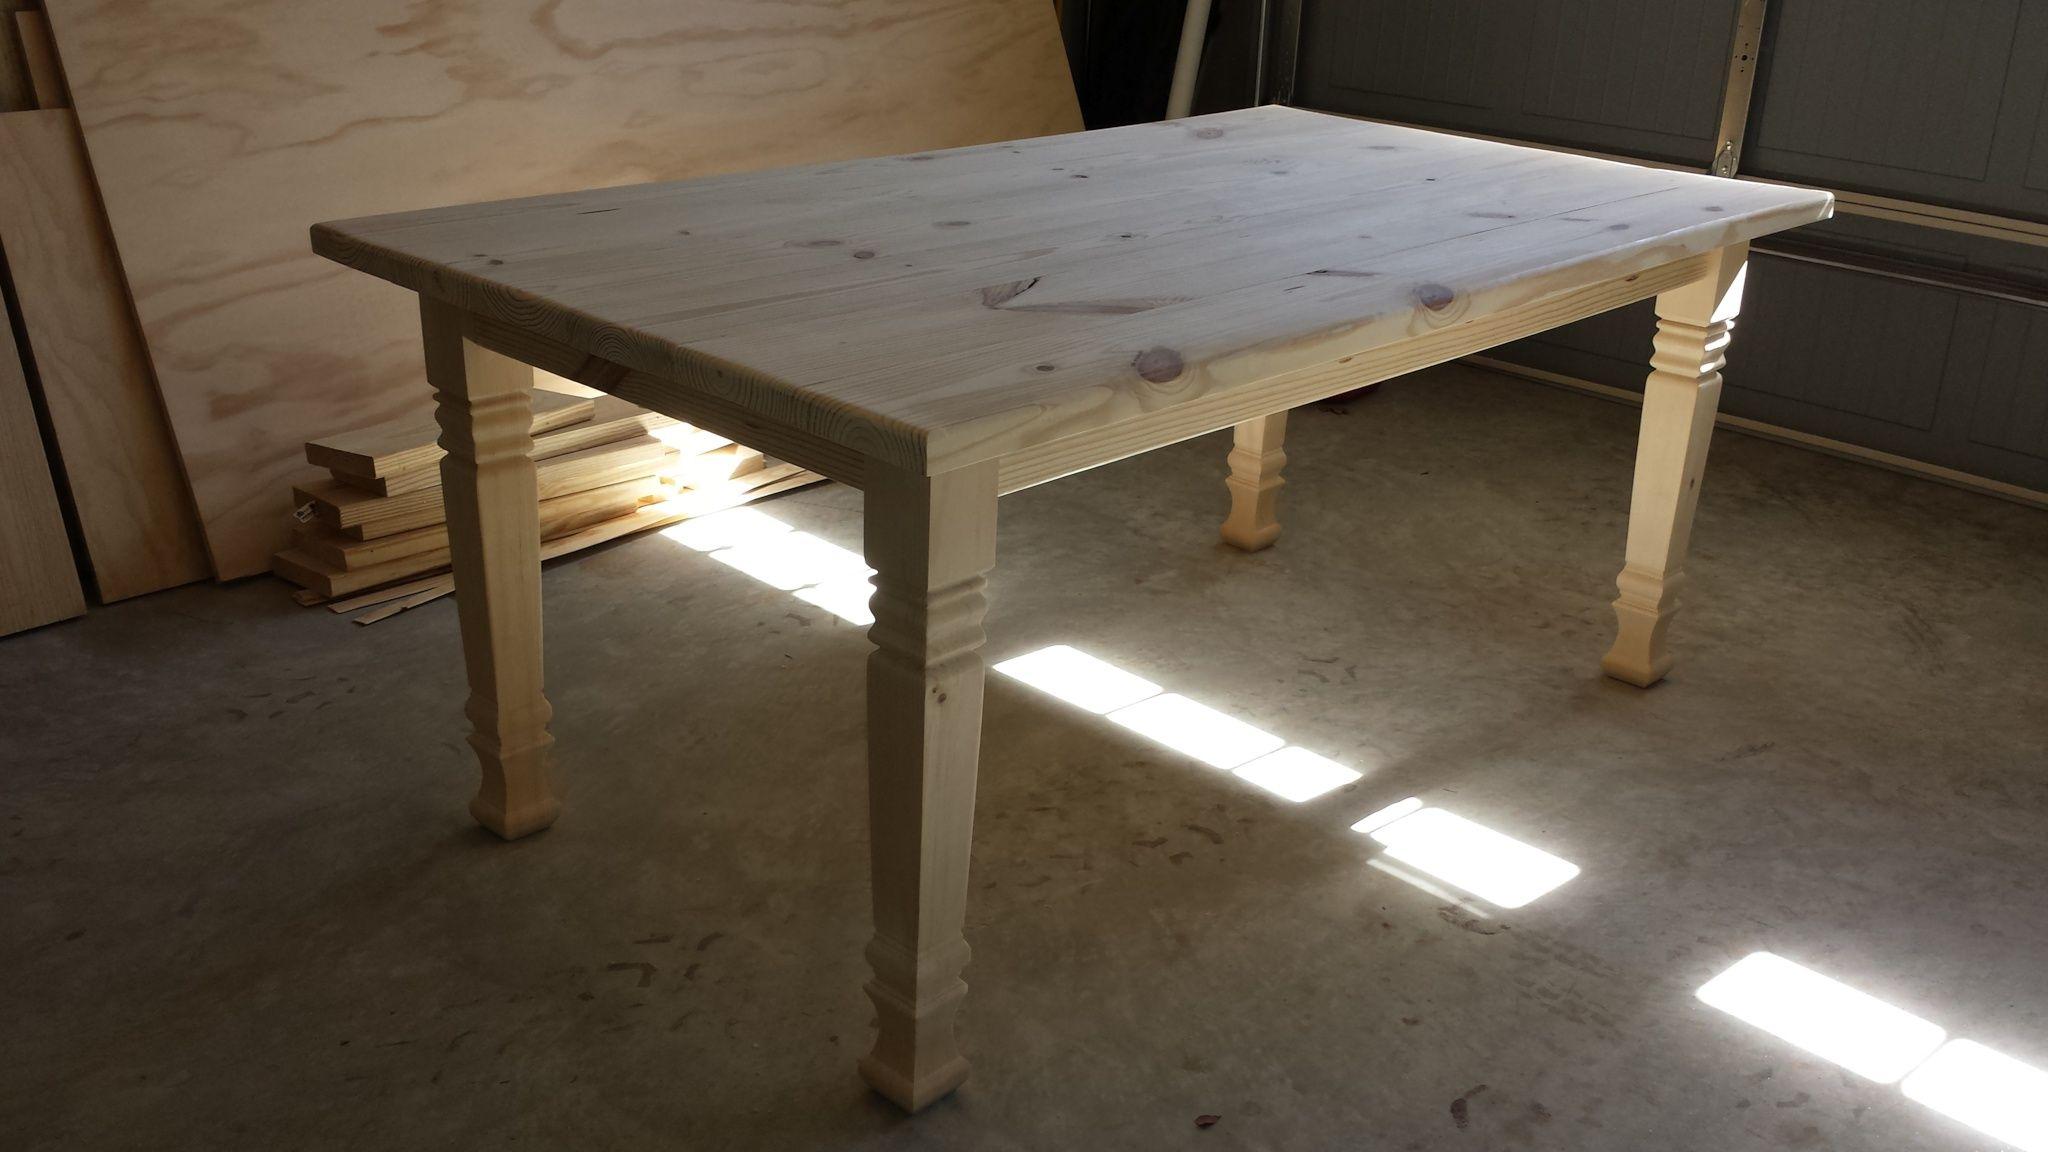 The Perfect Farmhouse Table With Osborne Square Farm Table Legs